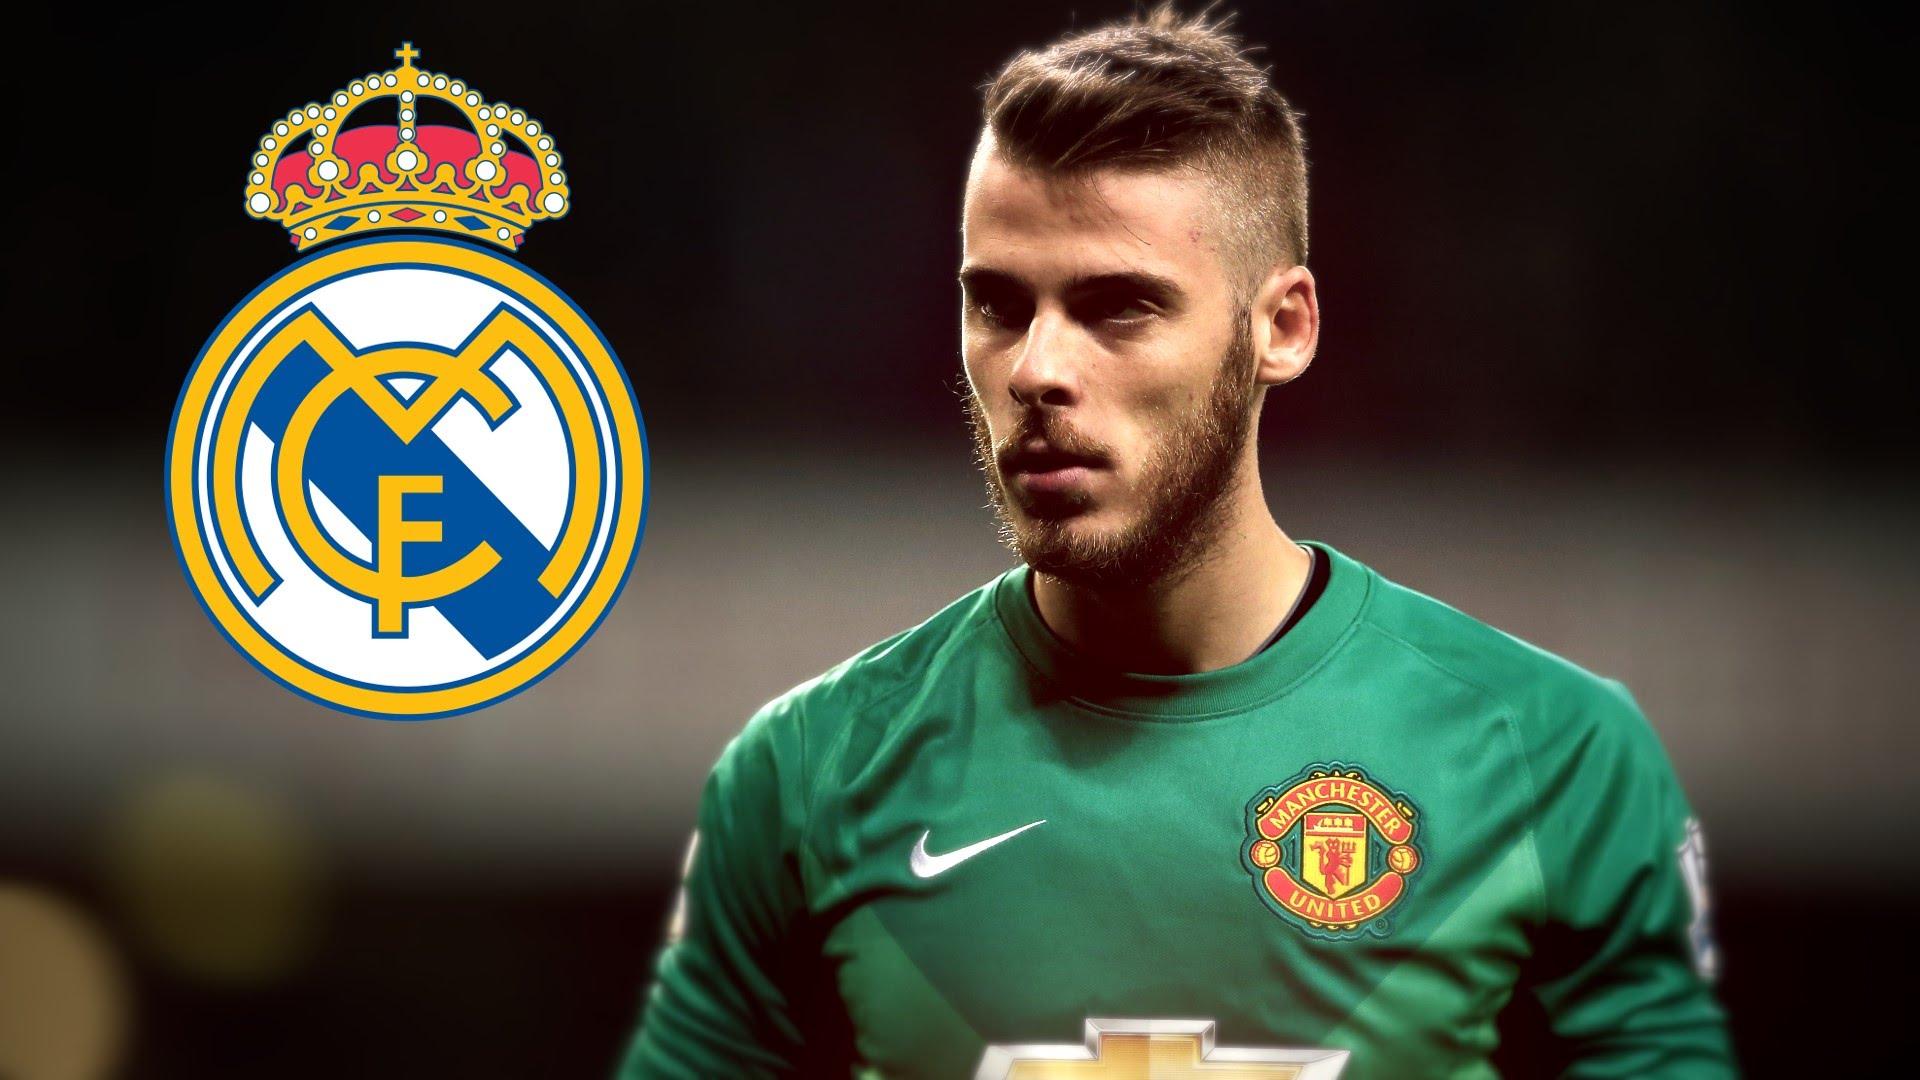 Transfer rumors Real Madrid is set to sign David De Gea